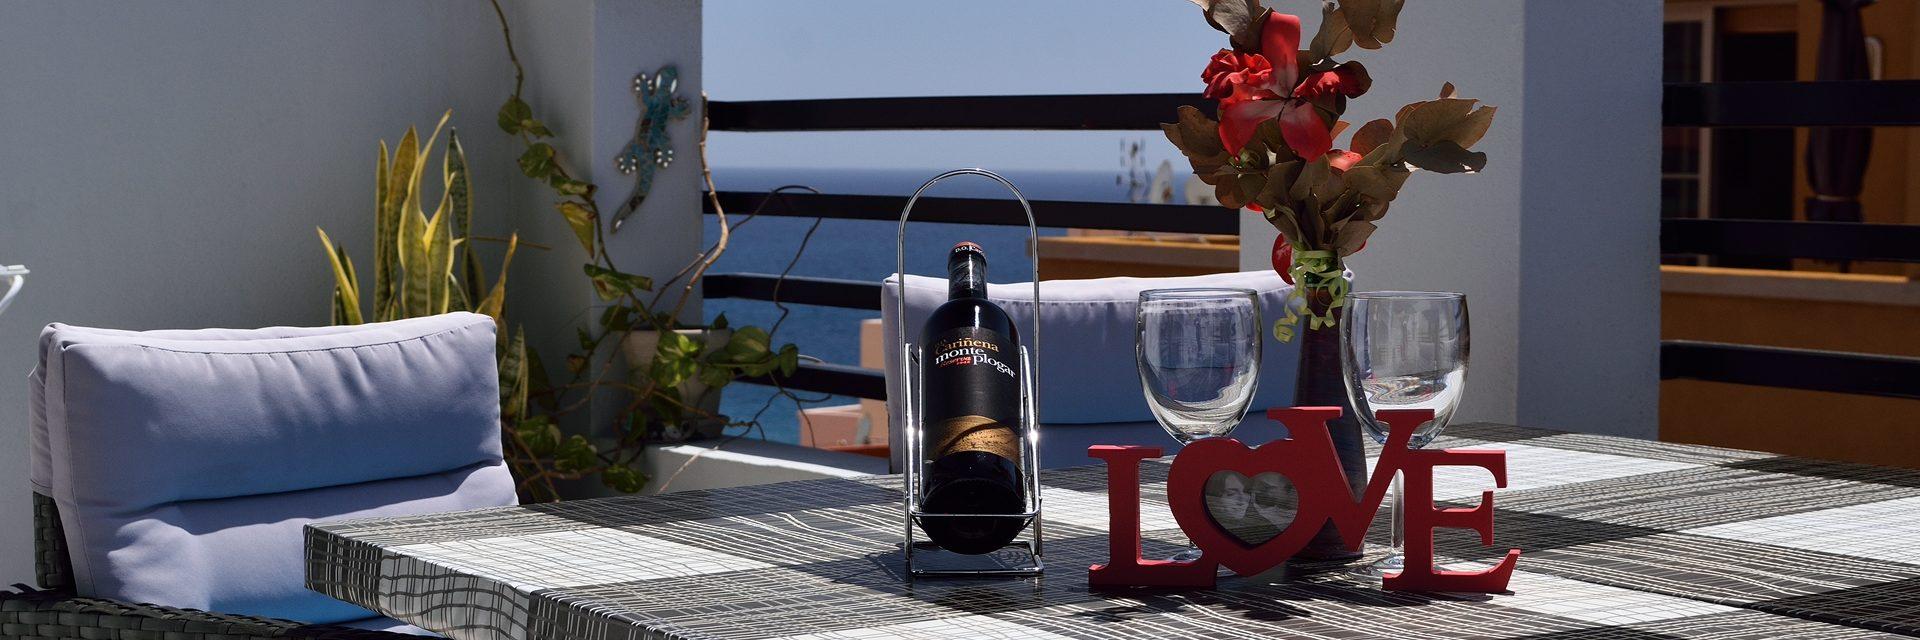 Penthouse Carpe Diem - La Palma - Canarische Eilanden